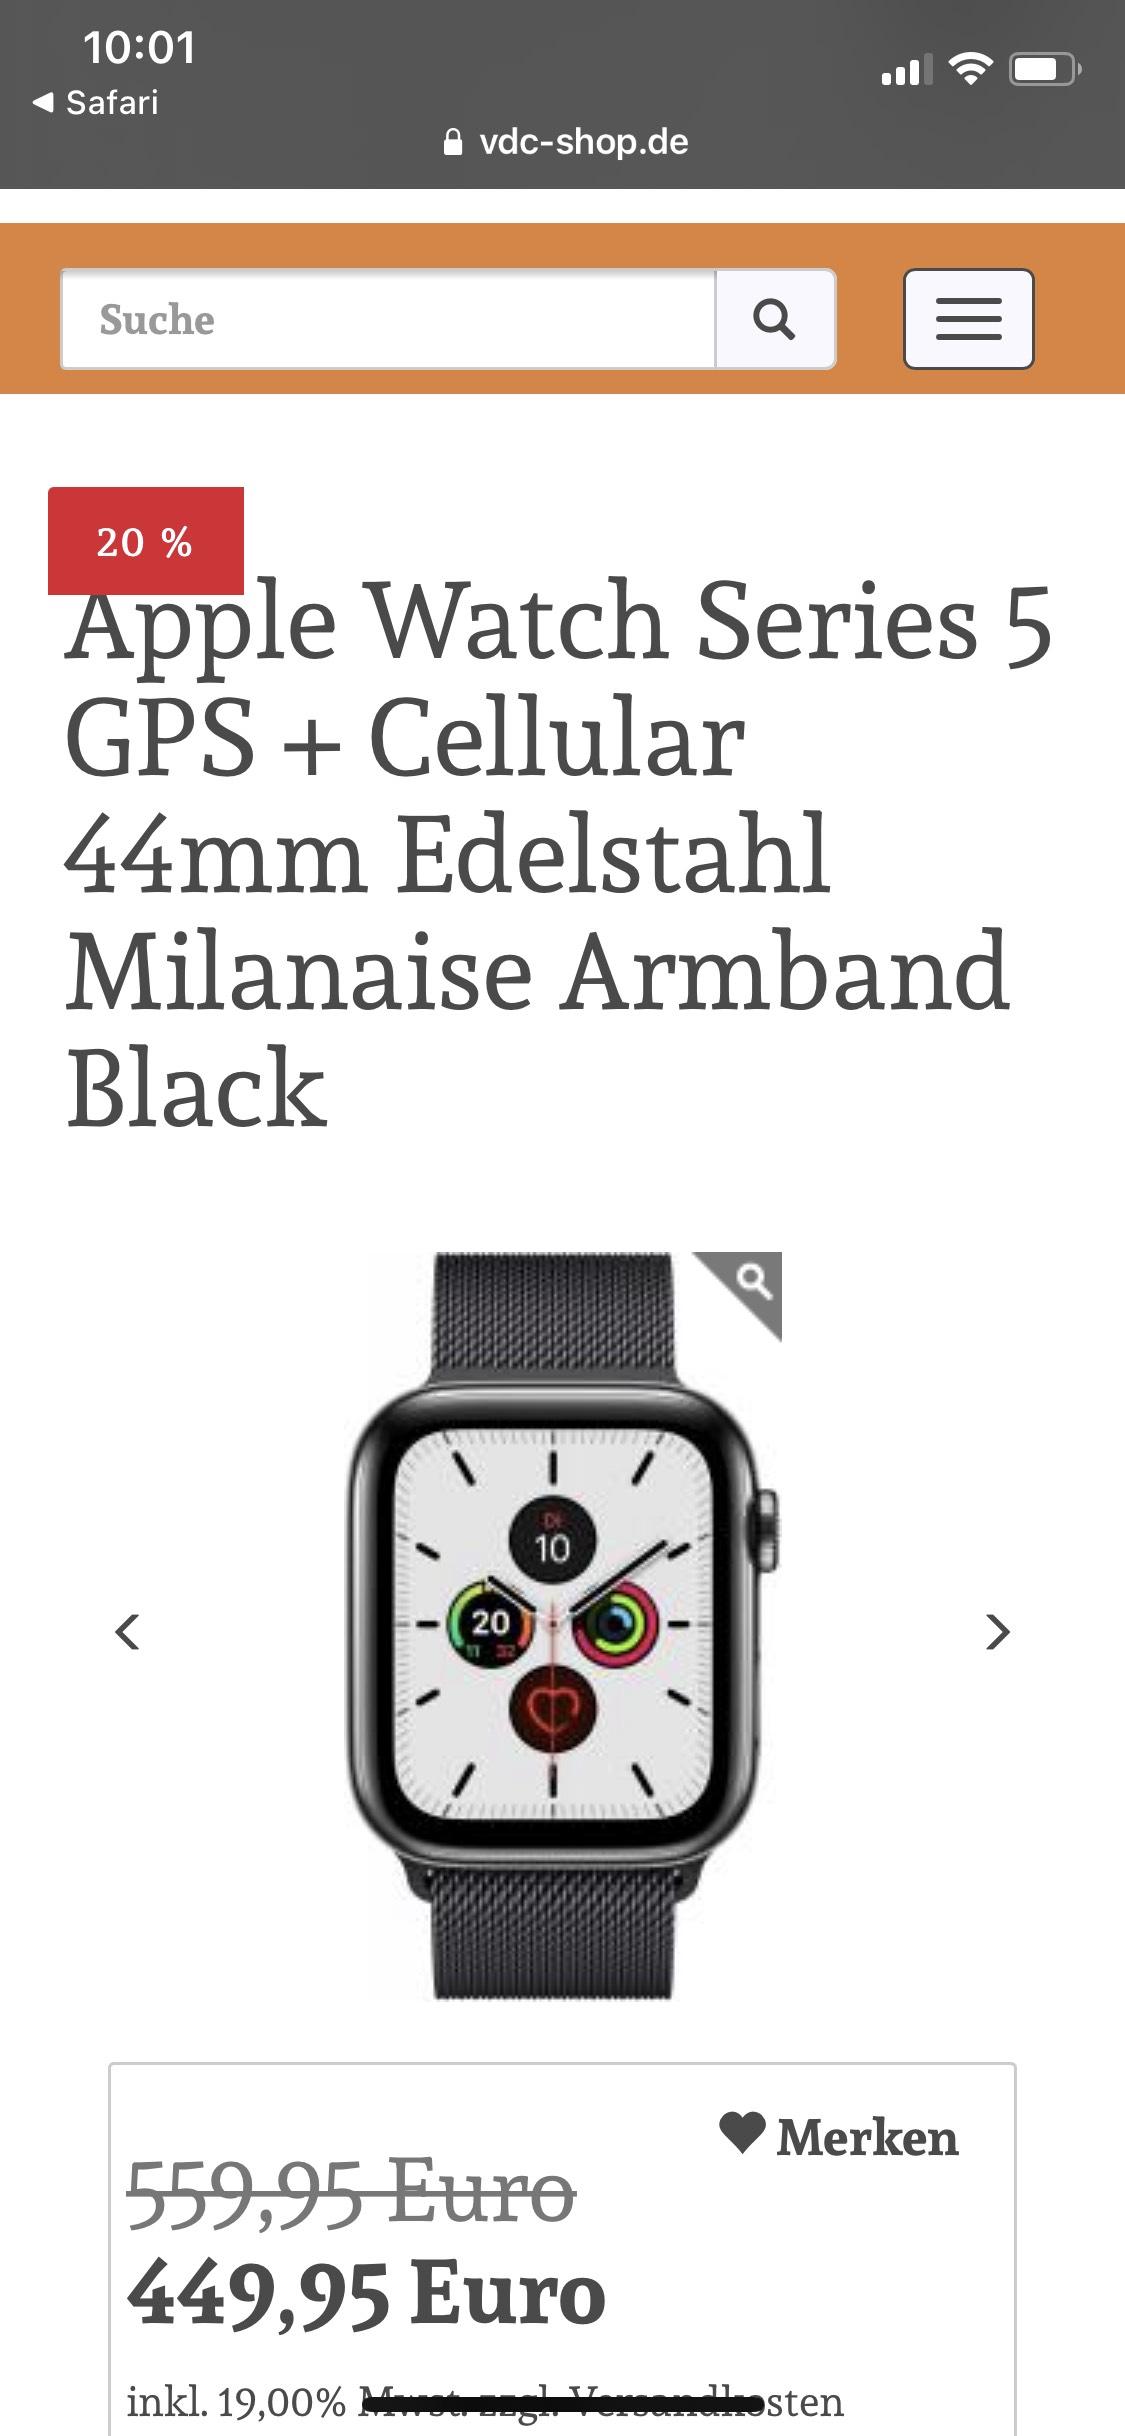 Apple Watch Series 5 GPS + Cellular 44mm Edelstahl Milanaise Armband Black